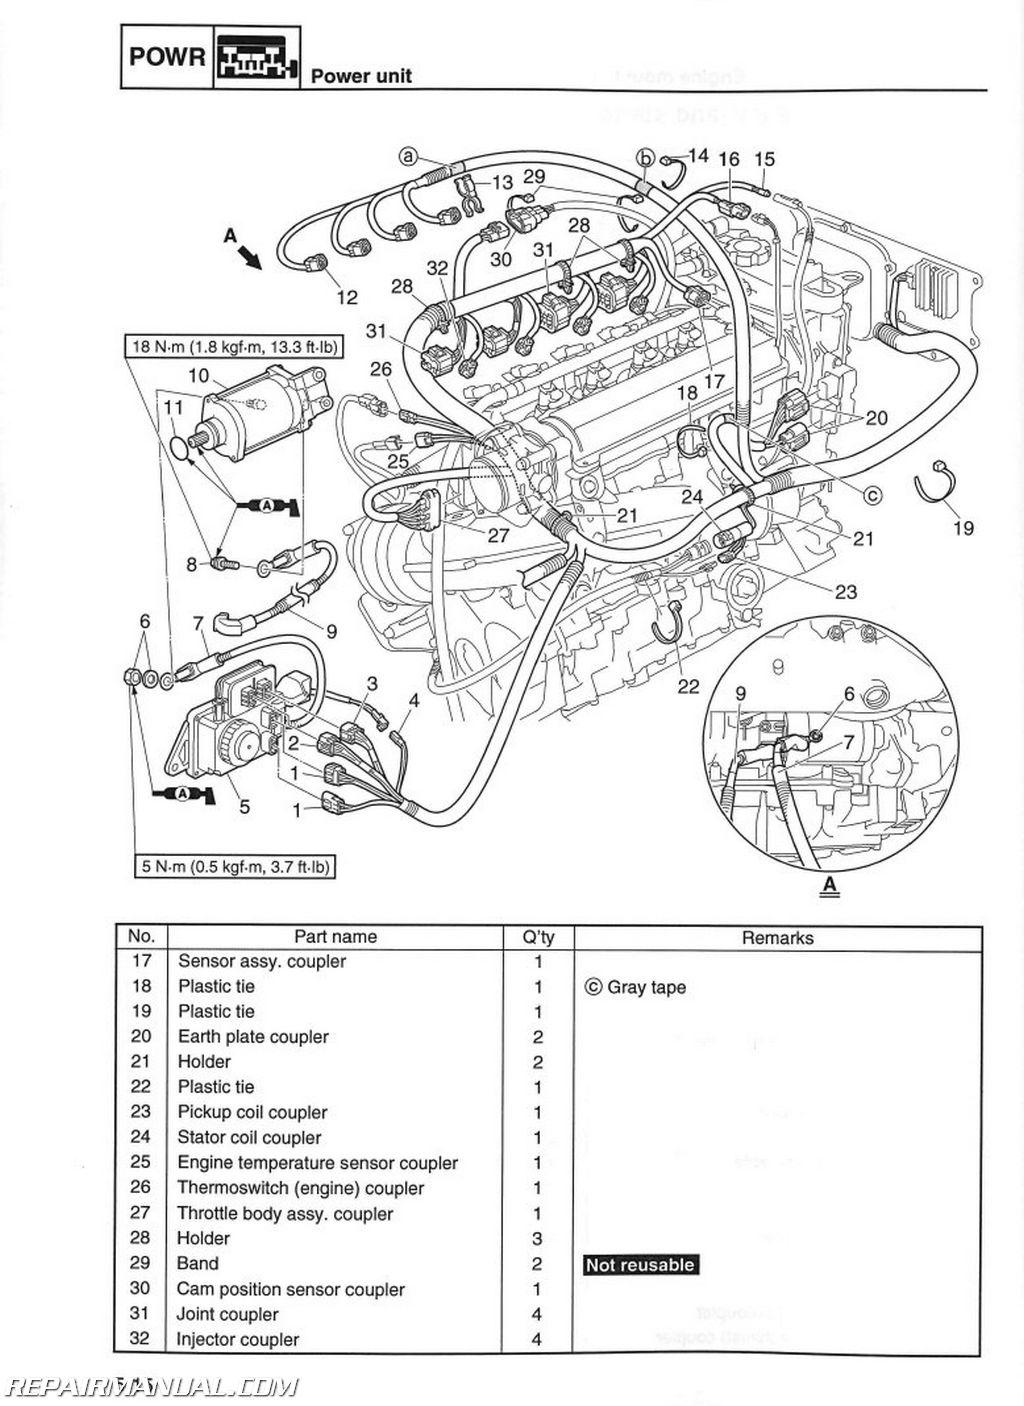 2012 yamaha rhino wiring diagram